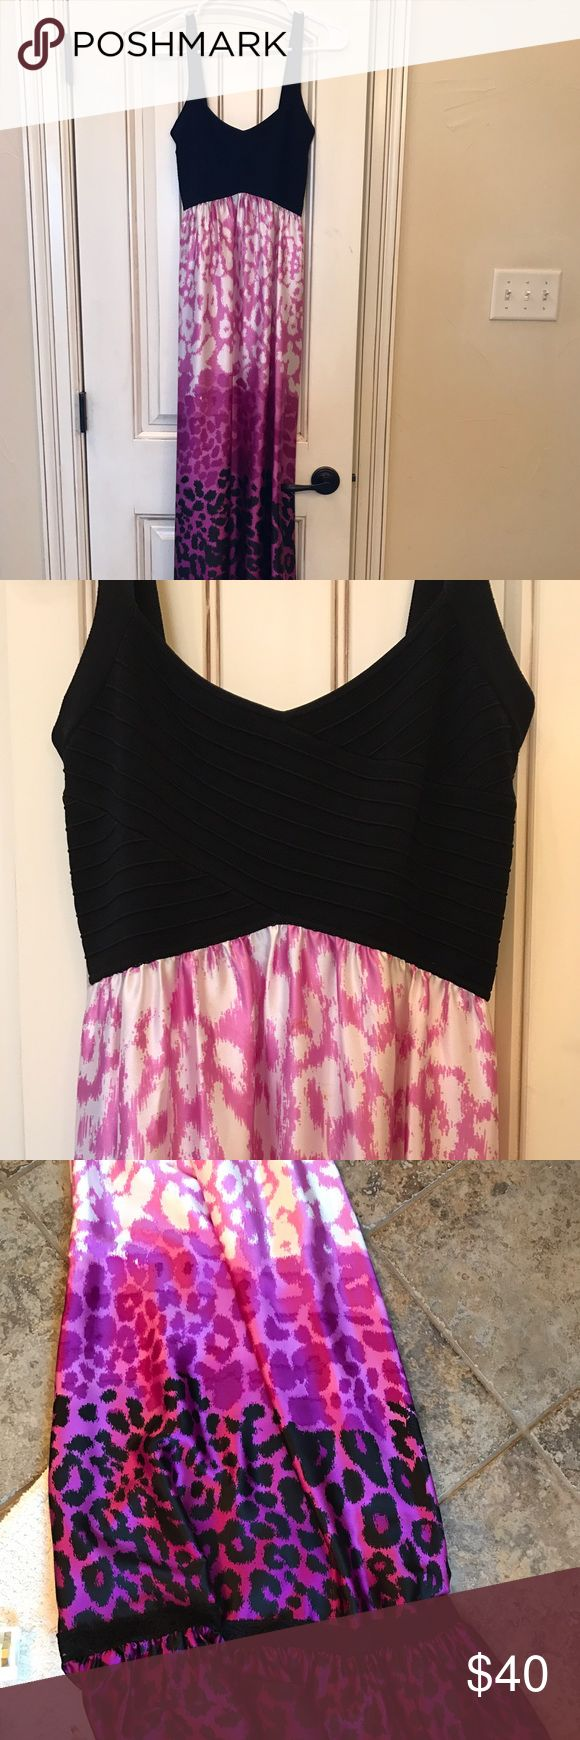 Bebe maxi dress Bebe ombré style leopard maxi dress bebe Dresses Maxi